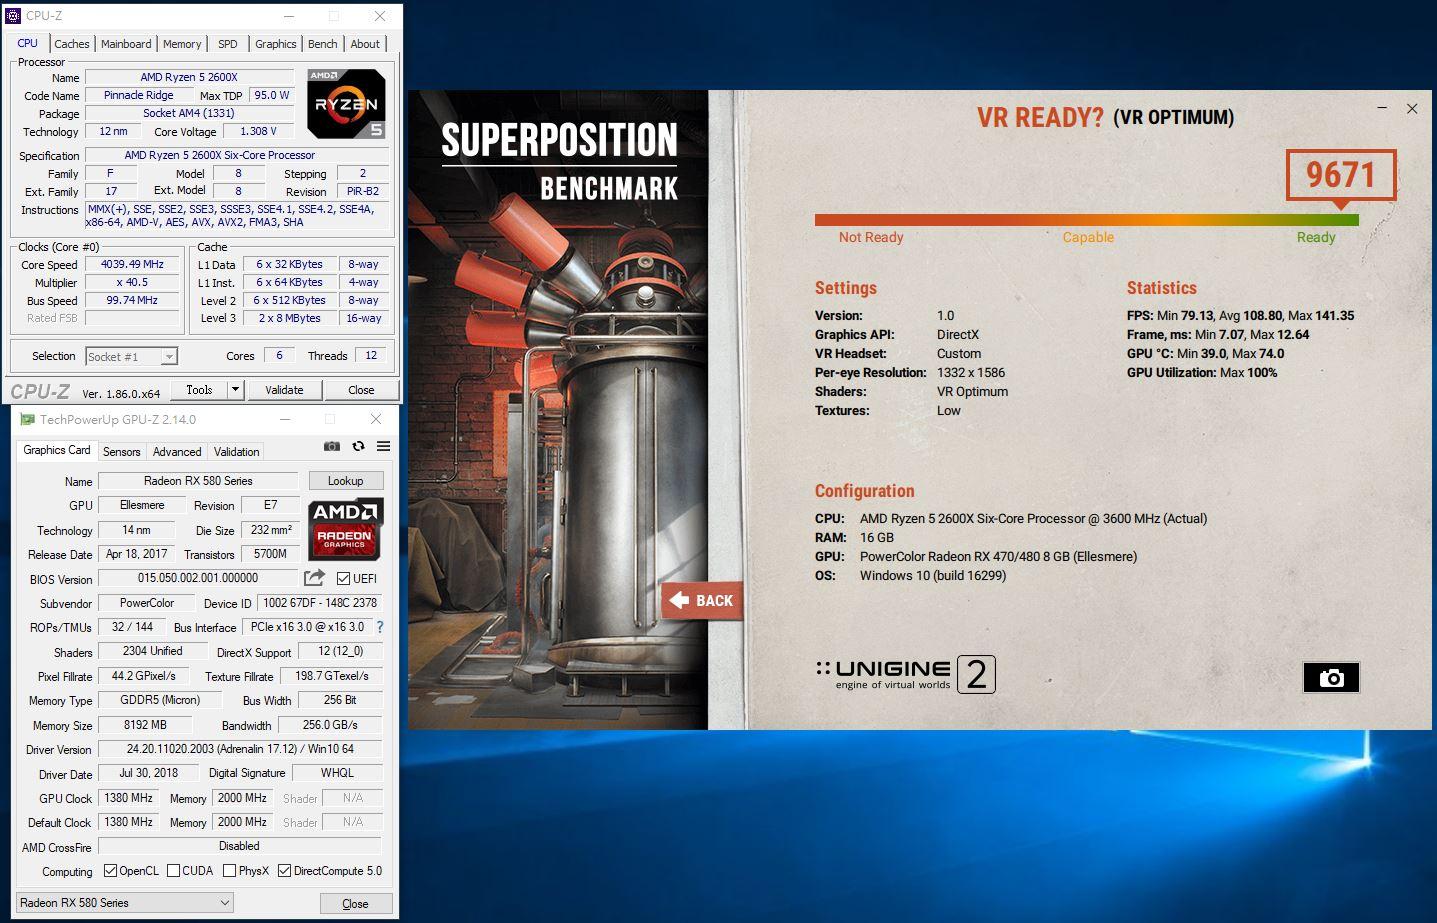 SUPERPOSITION_VR.JPG